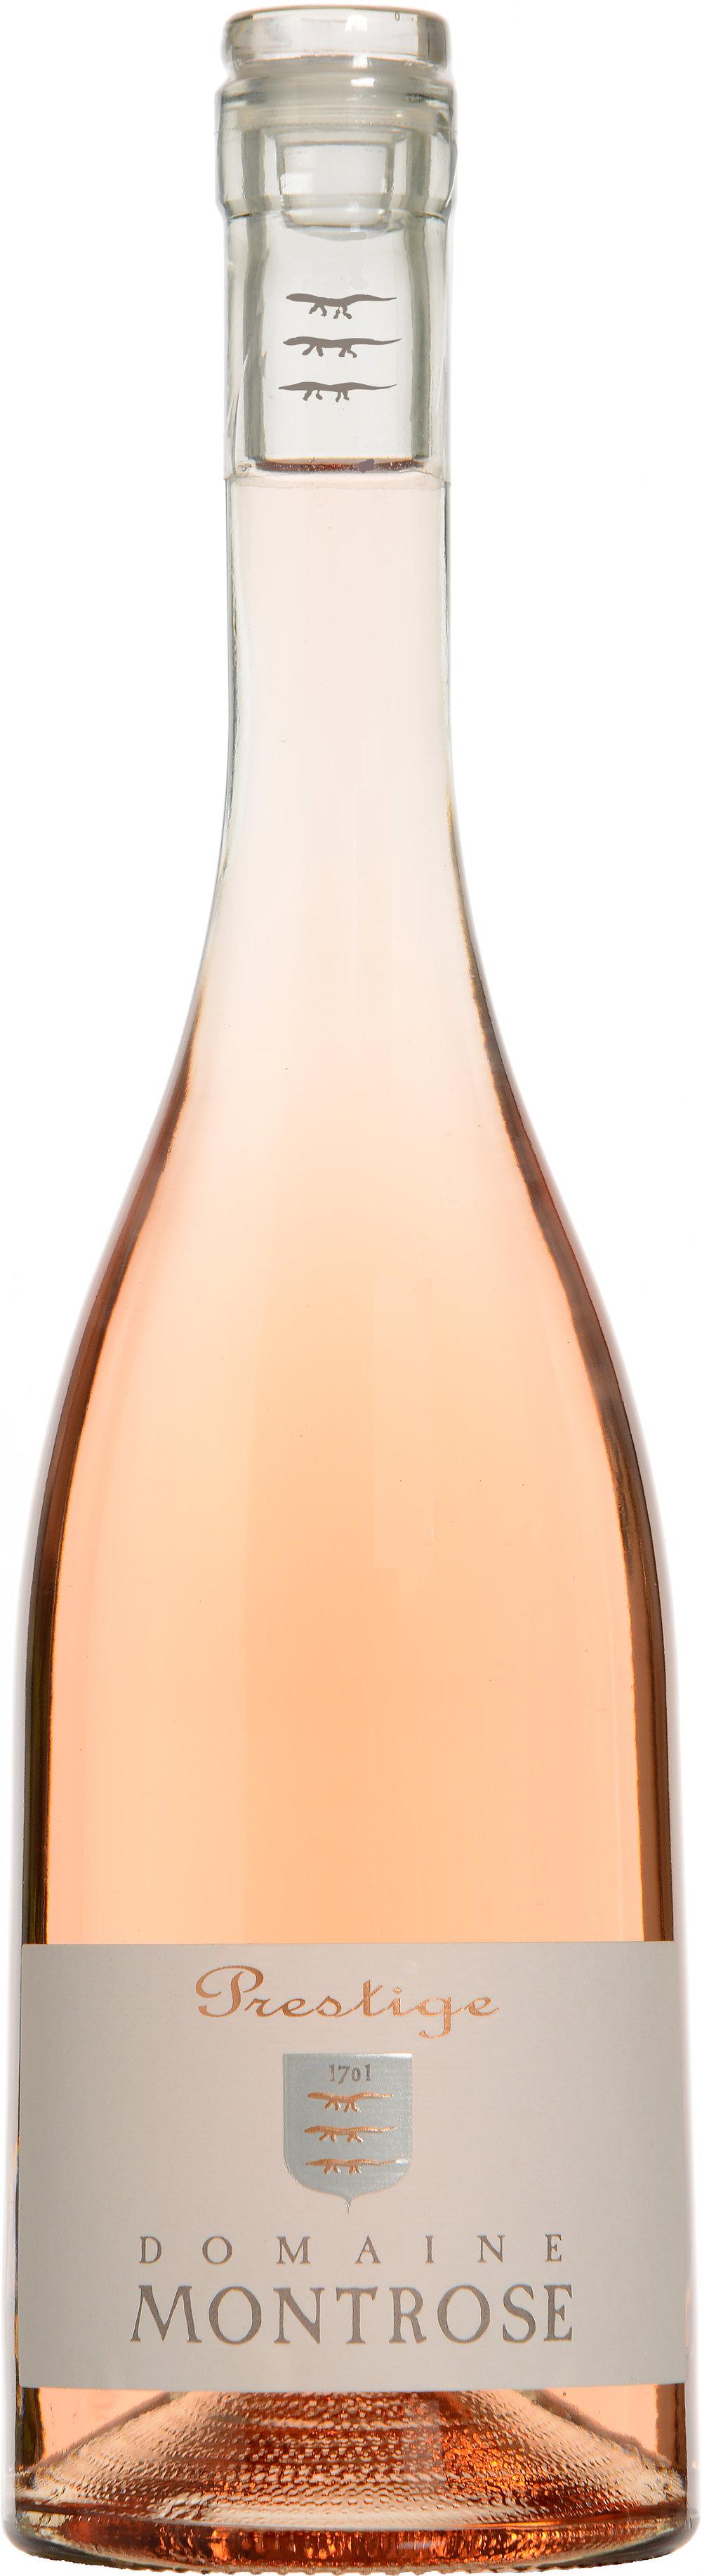 Domaine Montrose Prestige Rosé.jpg